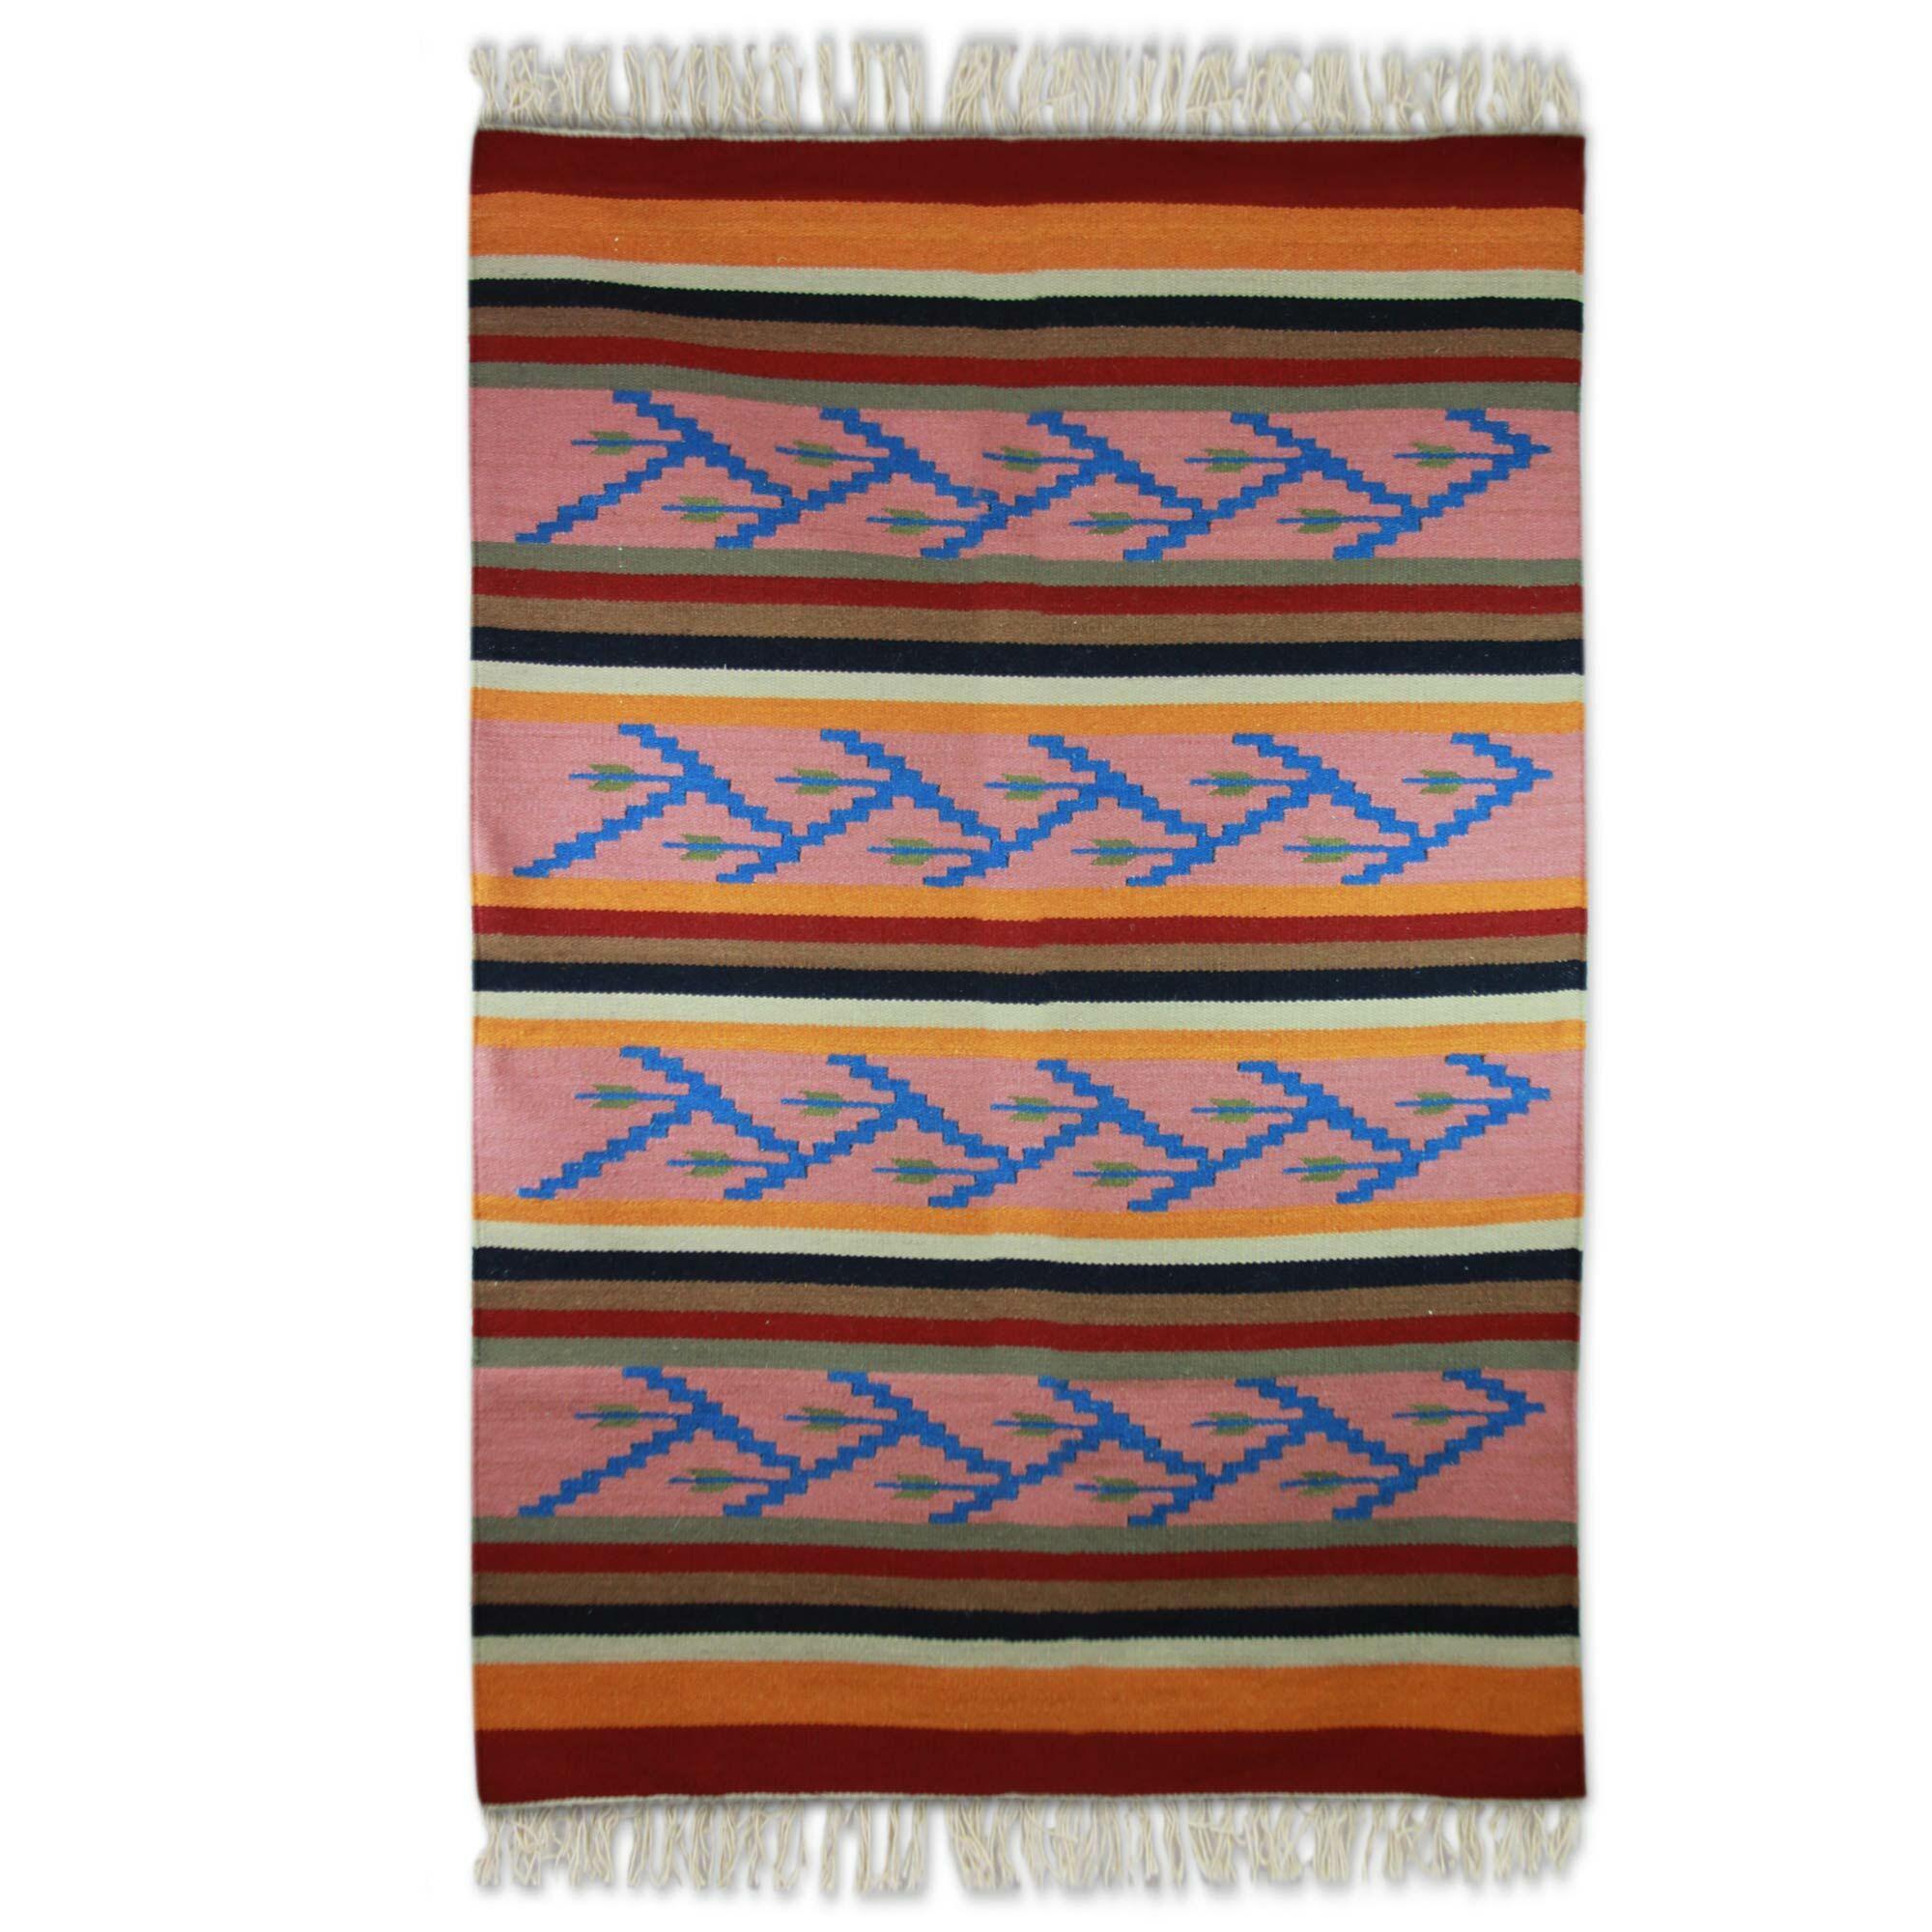 Zigzag Blooms Hand Woven Area Rug